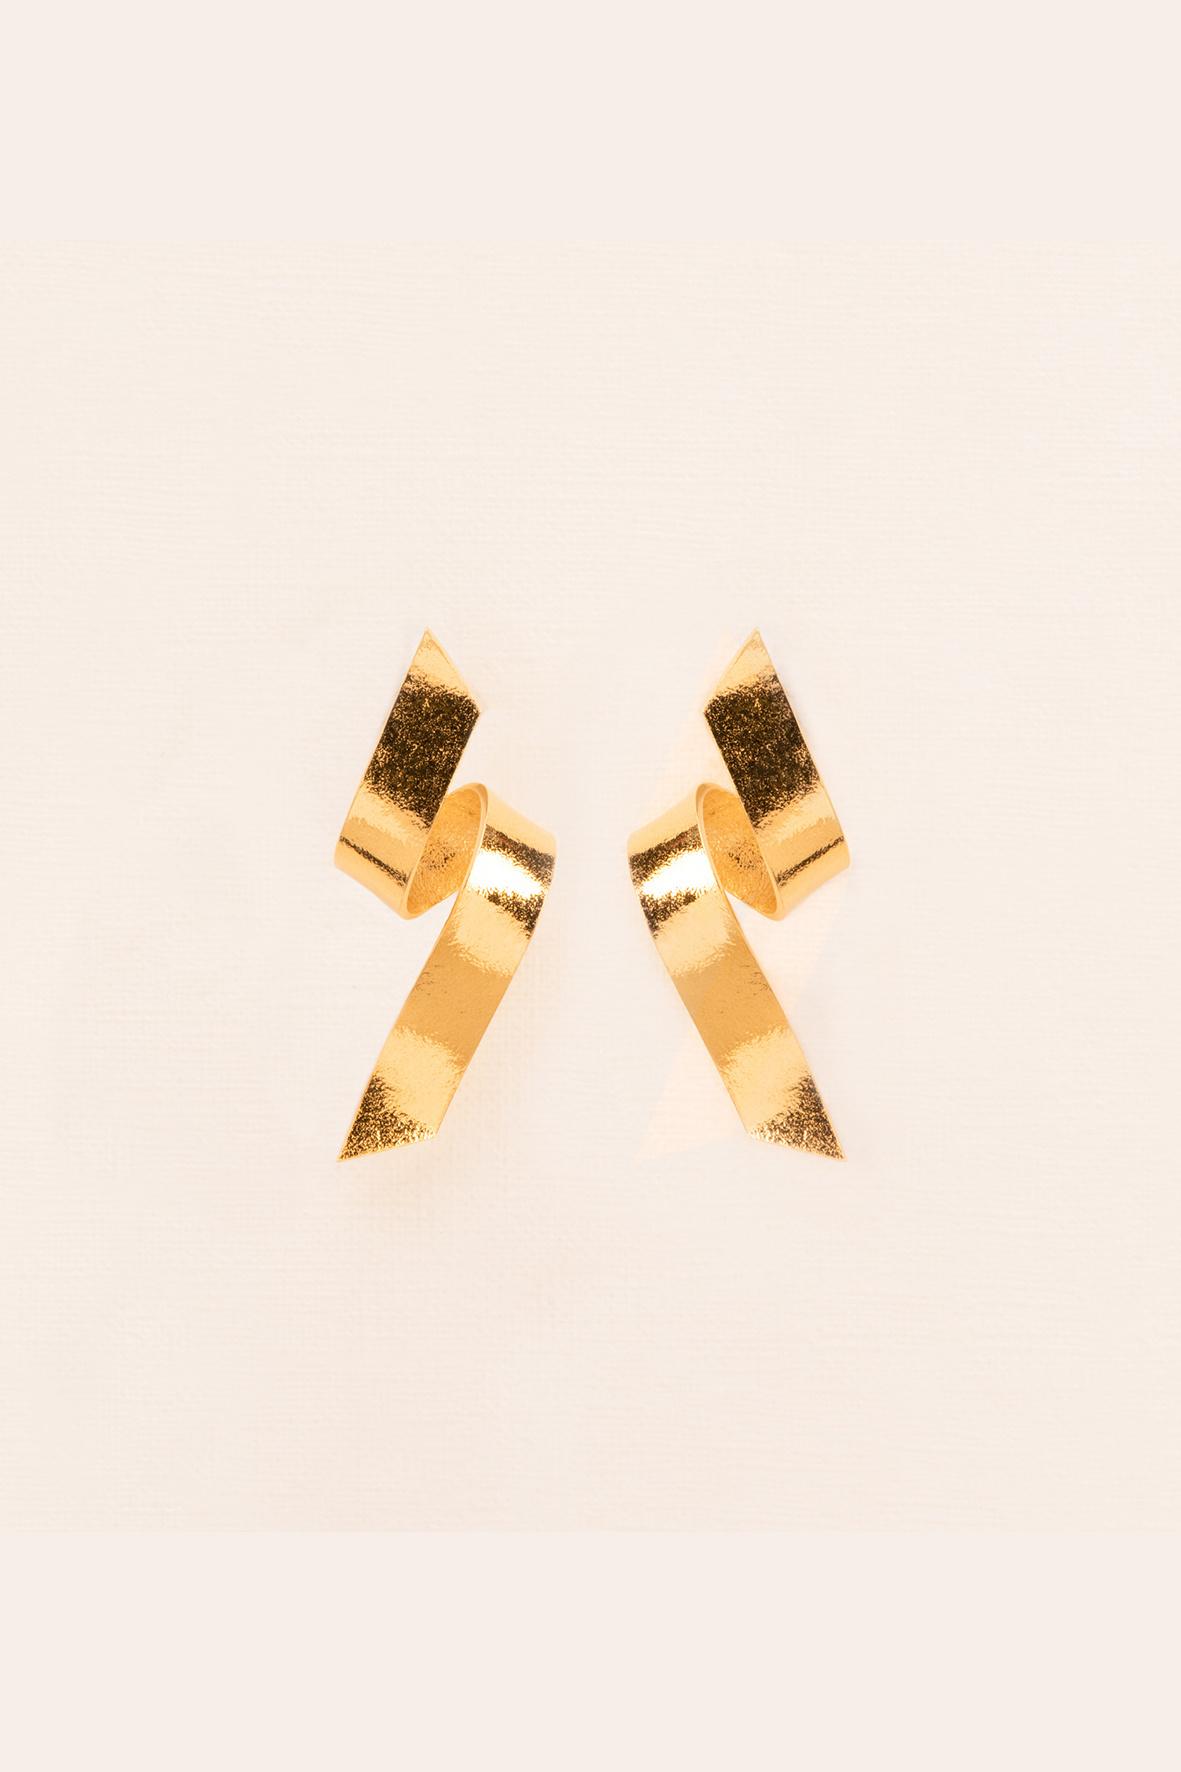 Serpentine stud earrings gold plated